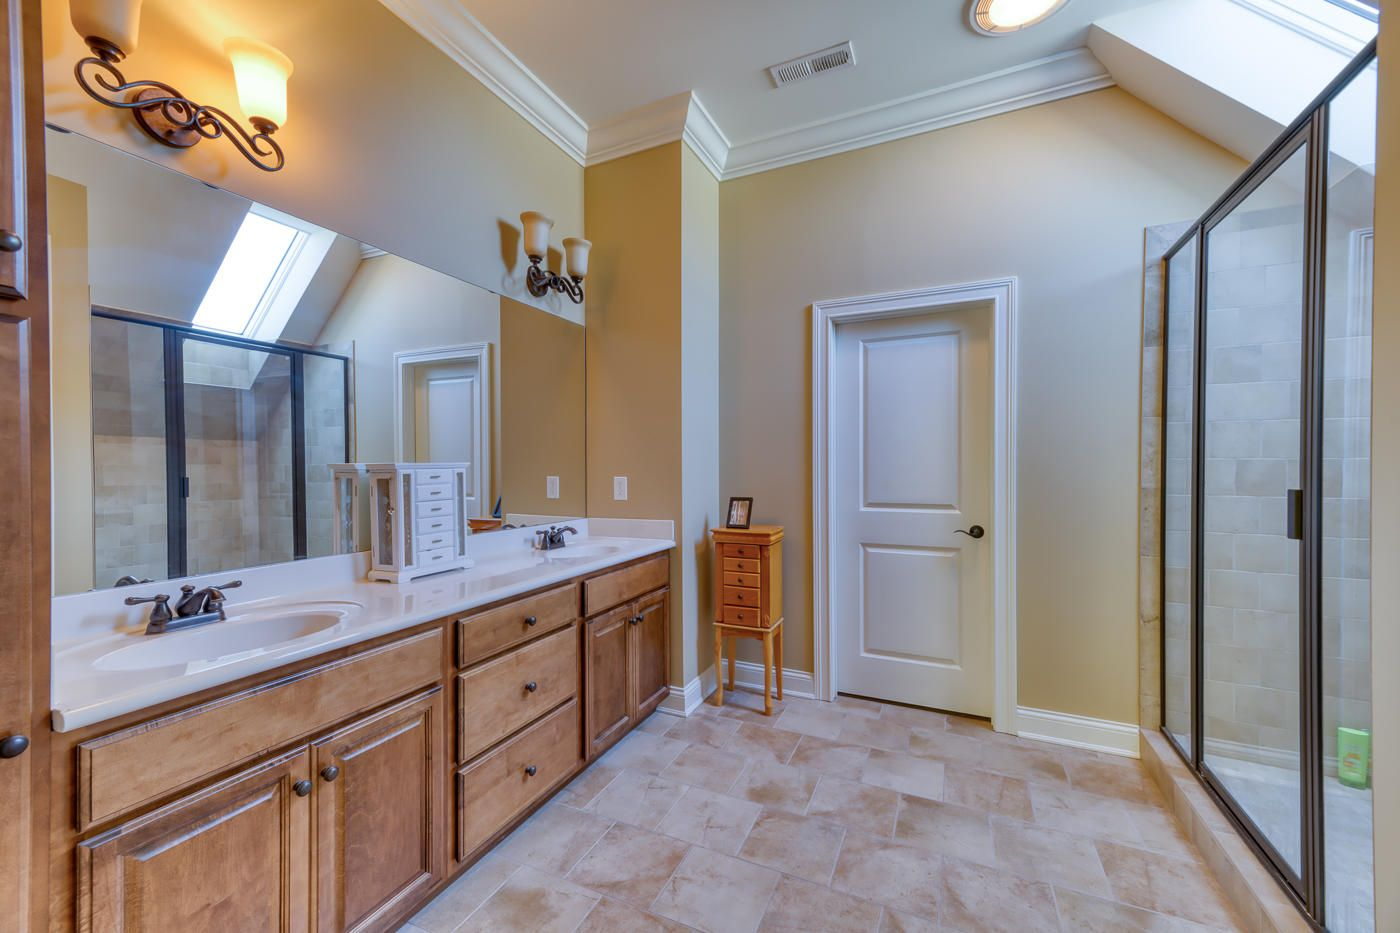 Upstairs Bedroom #1 Bathroom and Closet